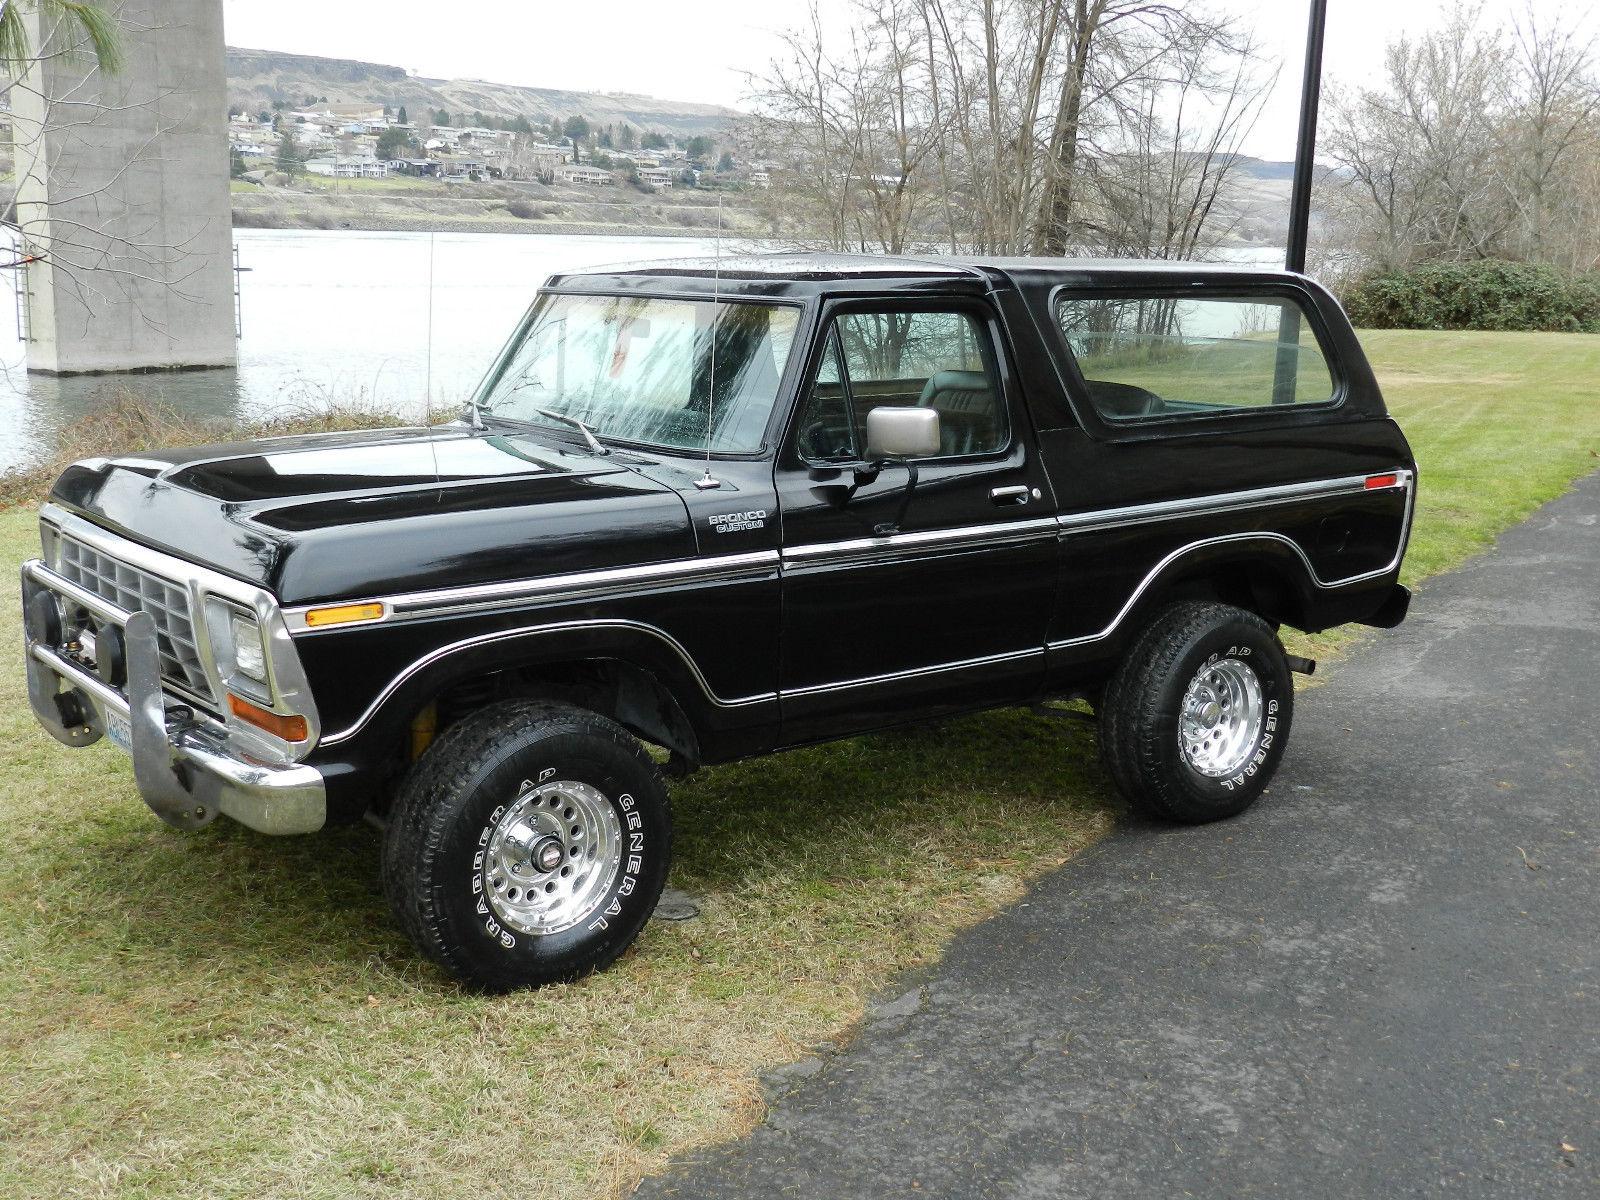 ford f150 bronco 1995 honda civic ac wiring diagram 1979 4x4 xlt black on classic solid